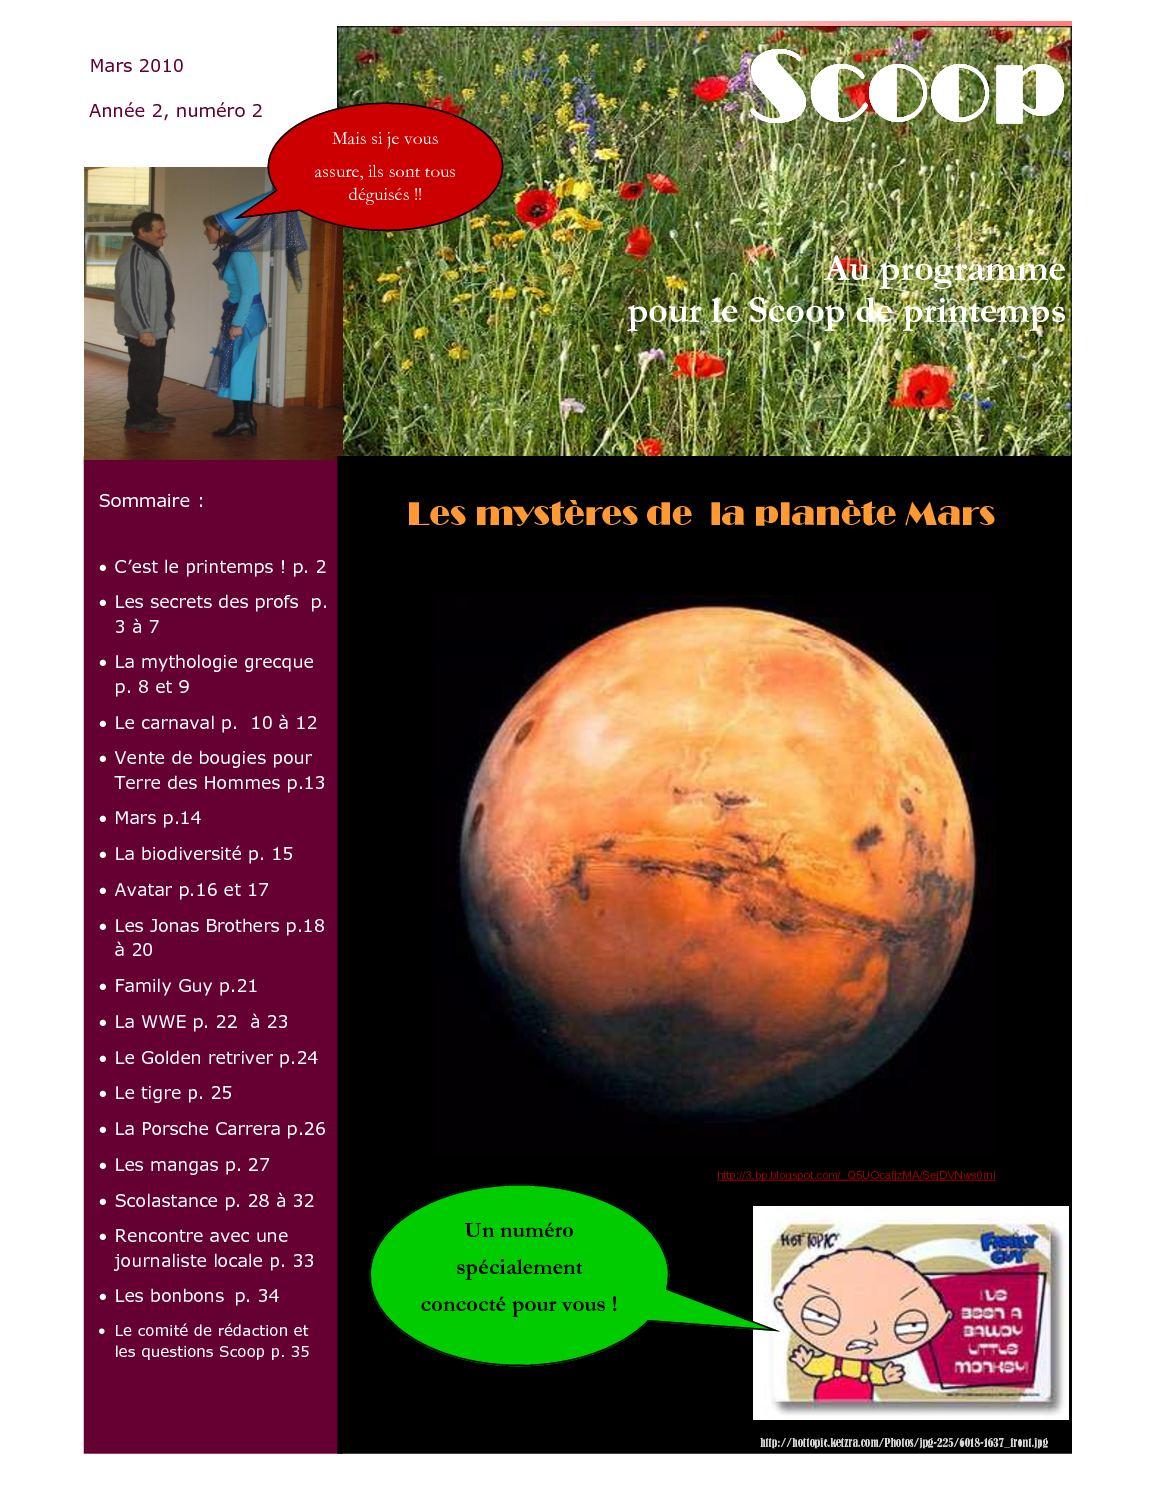 Applications de rencontres Corbeil-Essonnes vacances